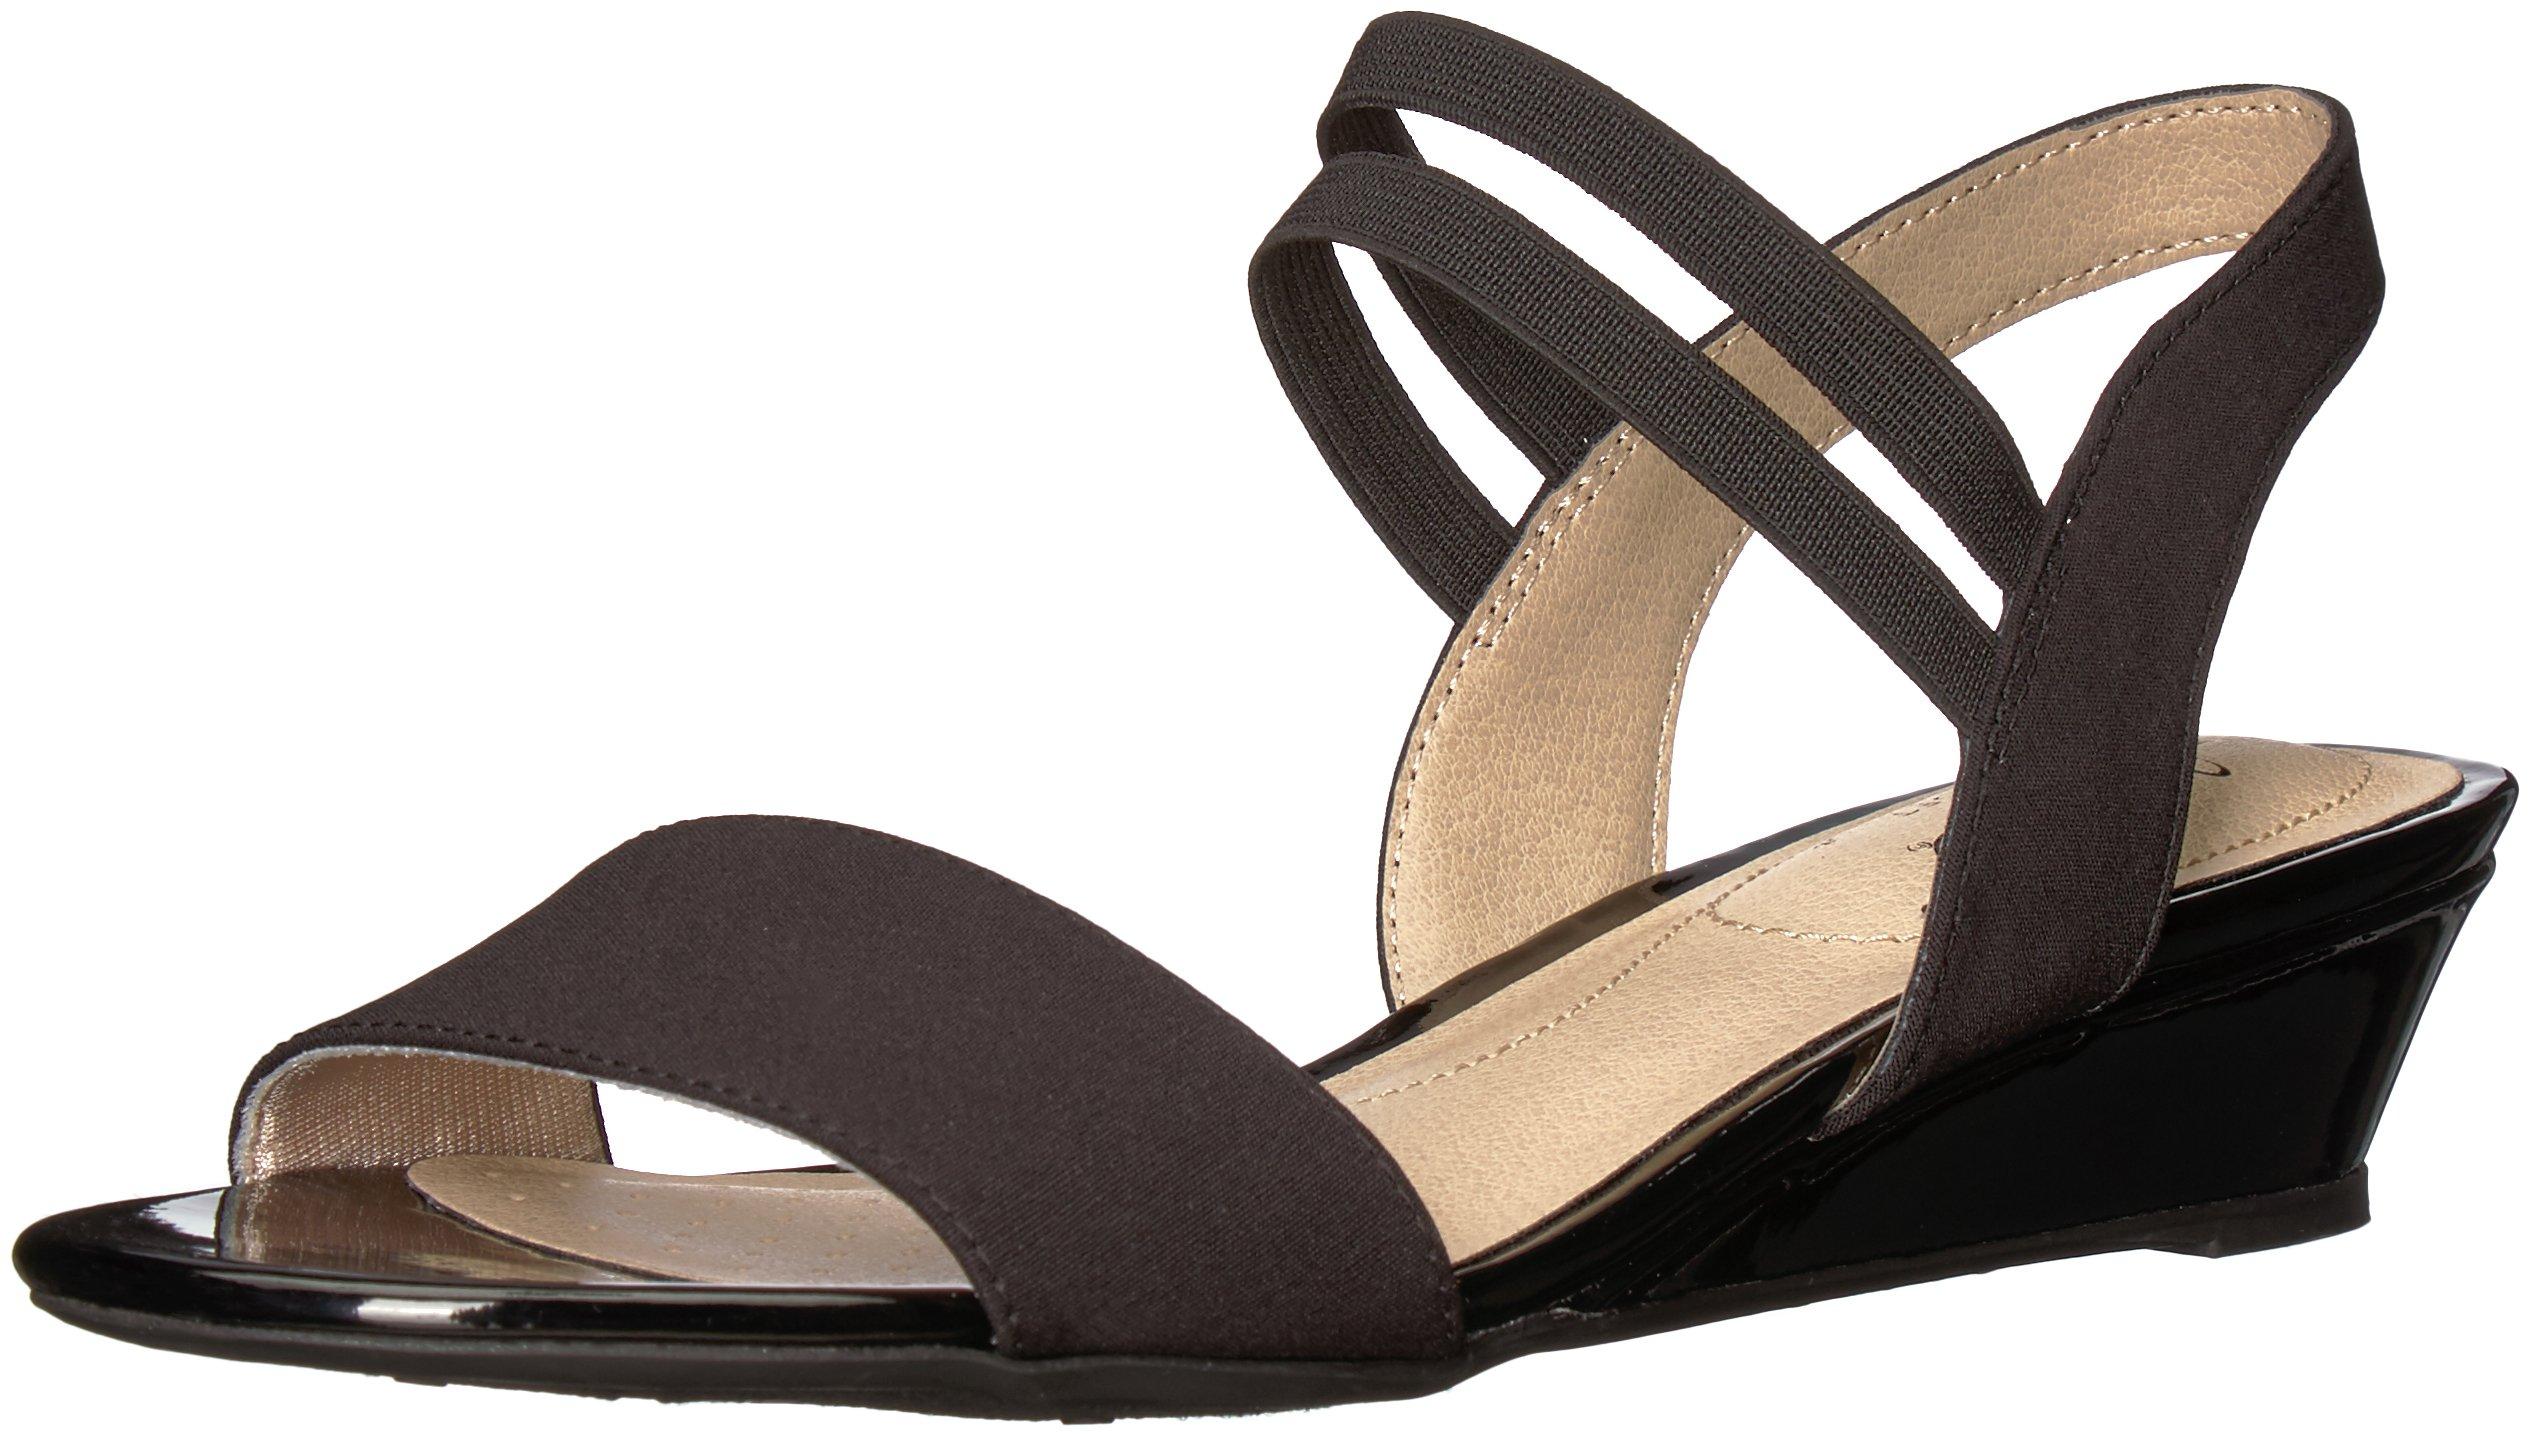 LifeStride Women's Yolo Wedge Sandal, Black, 5.5 M US